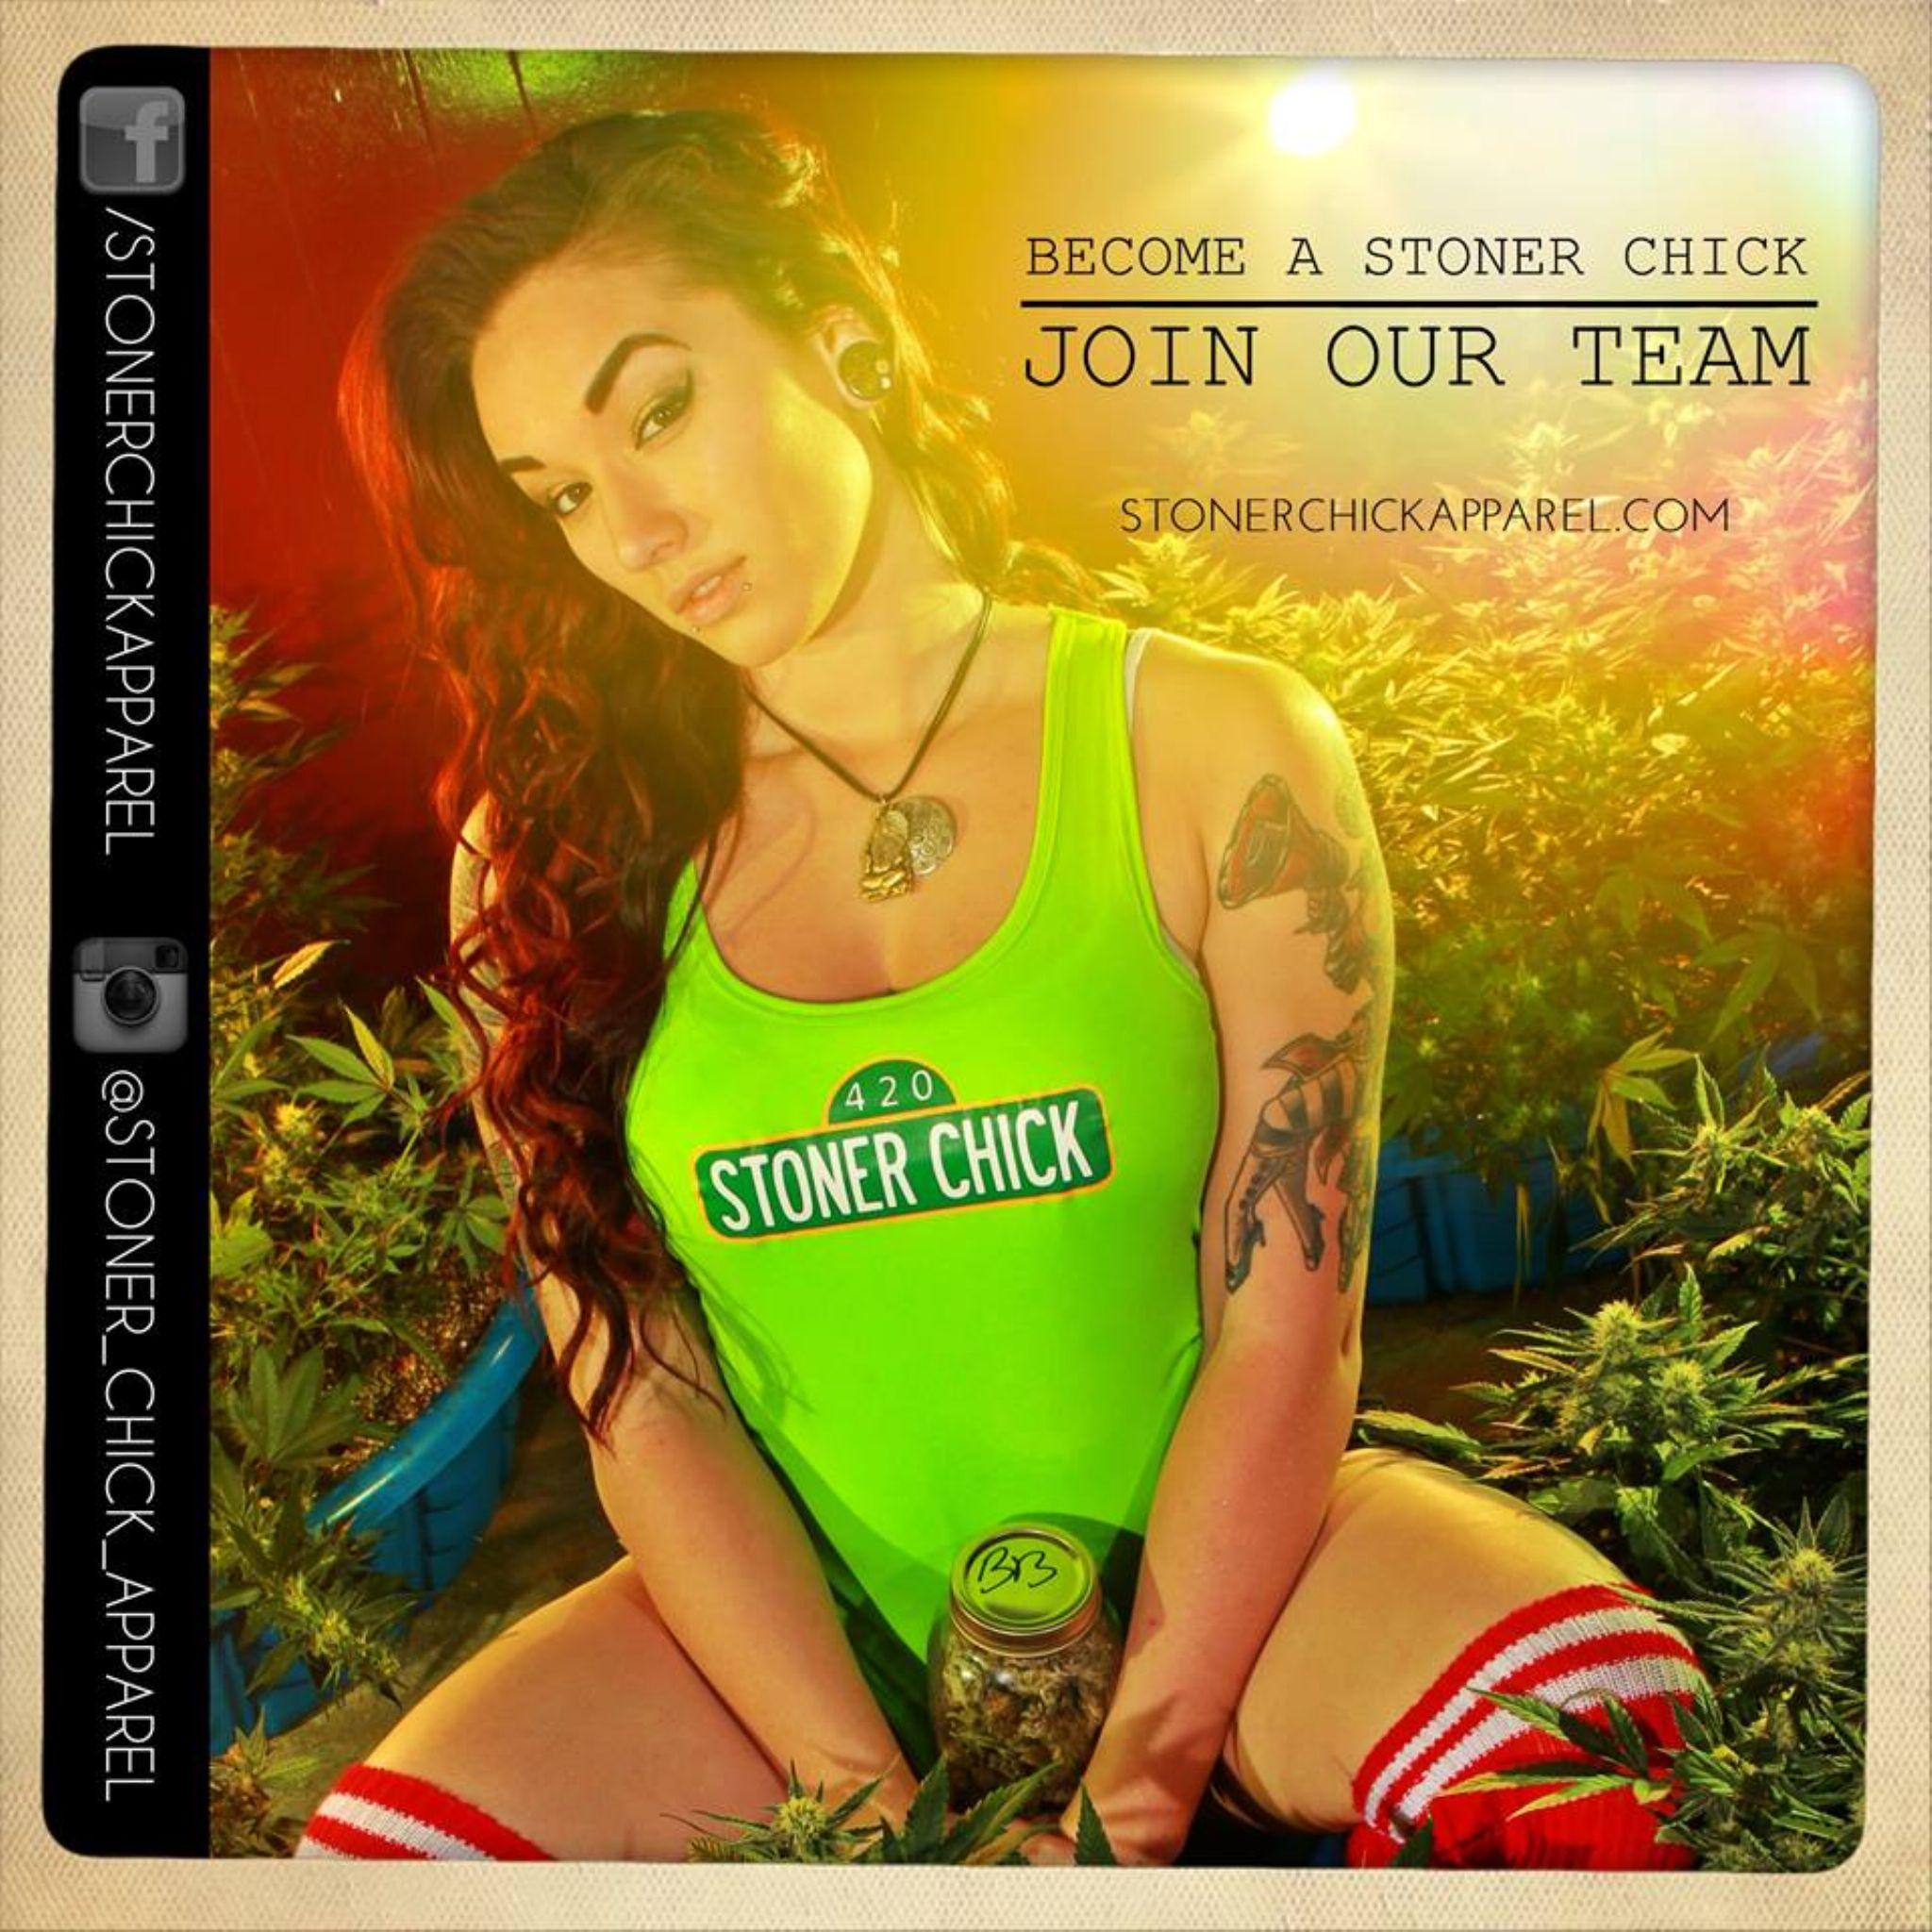 Stoner Chick Apparel - New Age Hippie by nichaulass